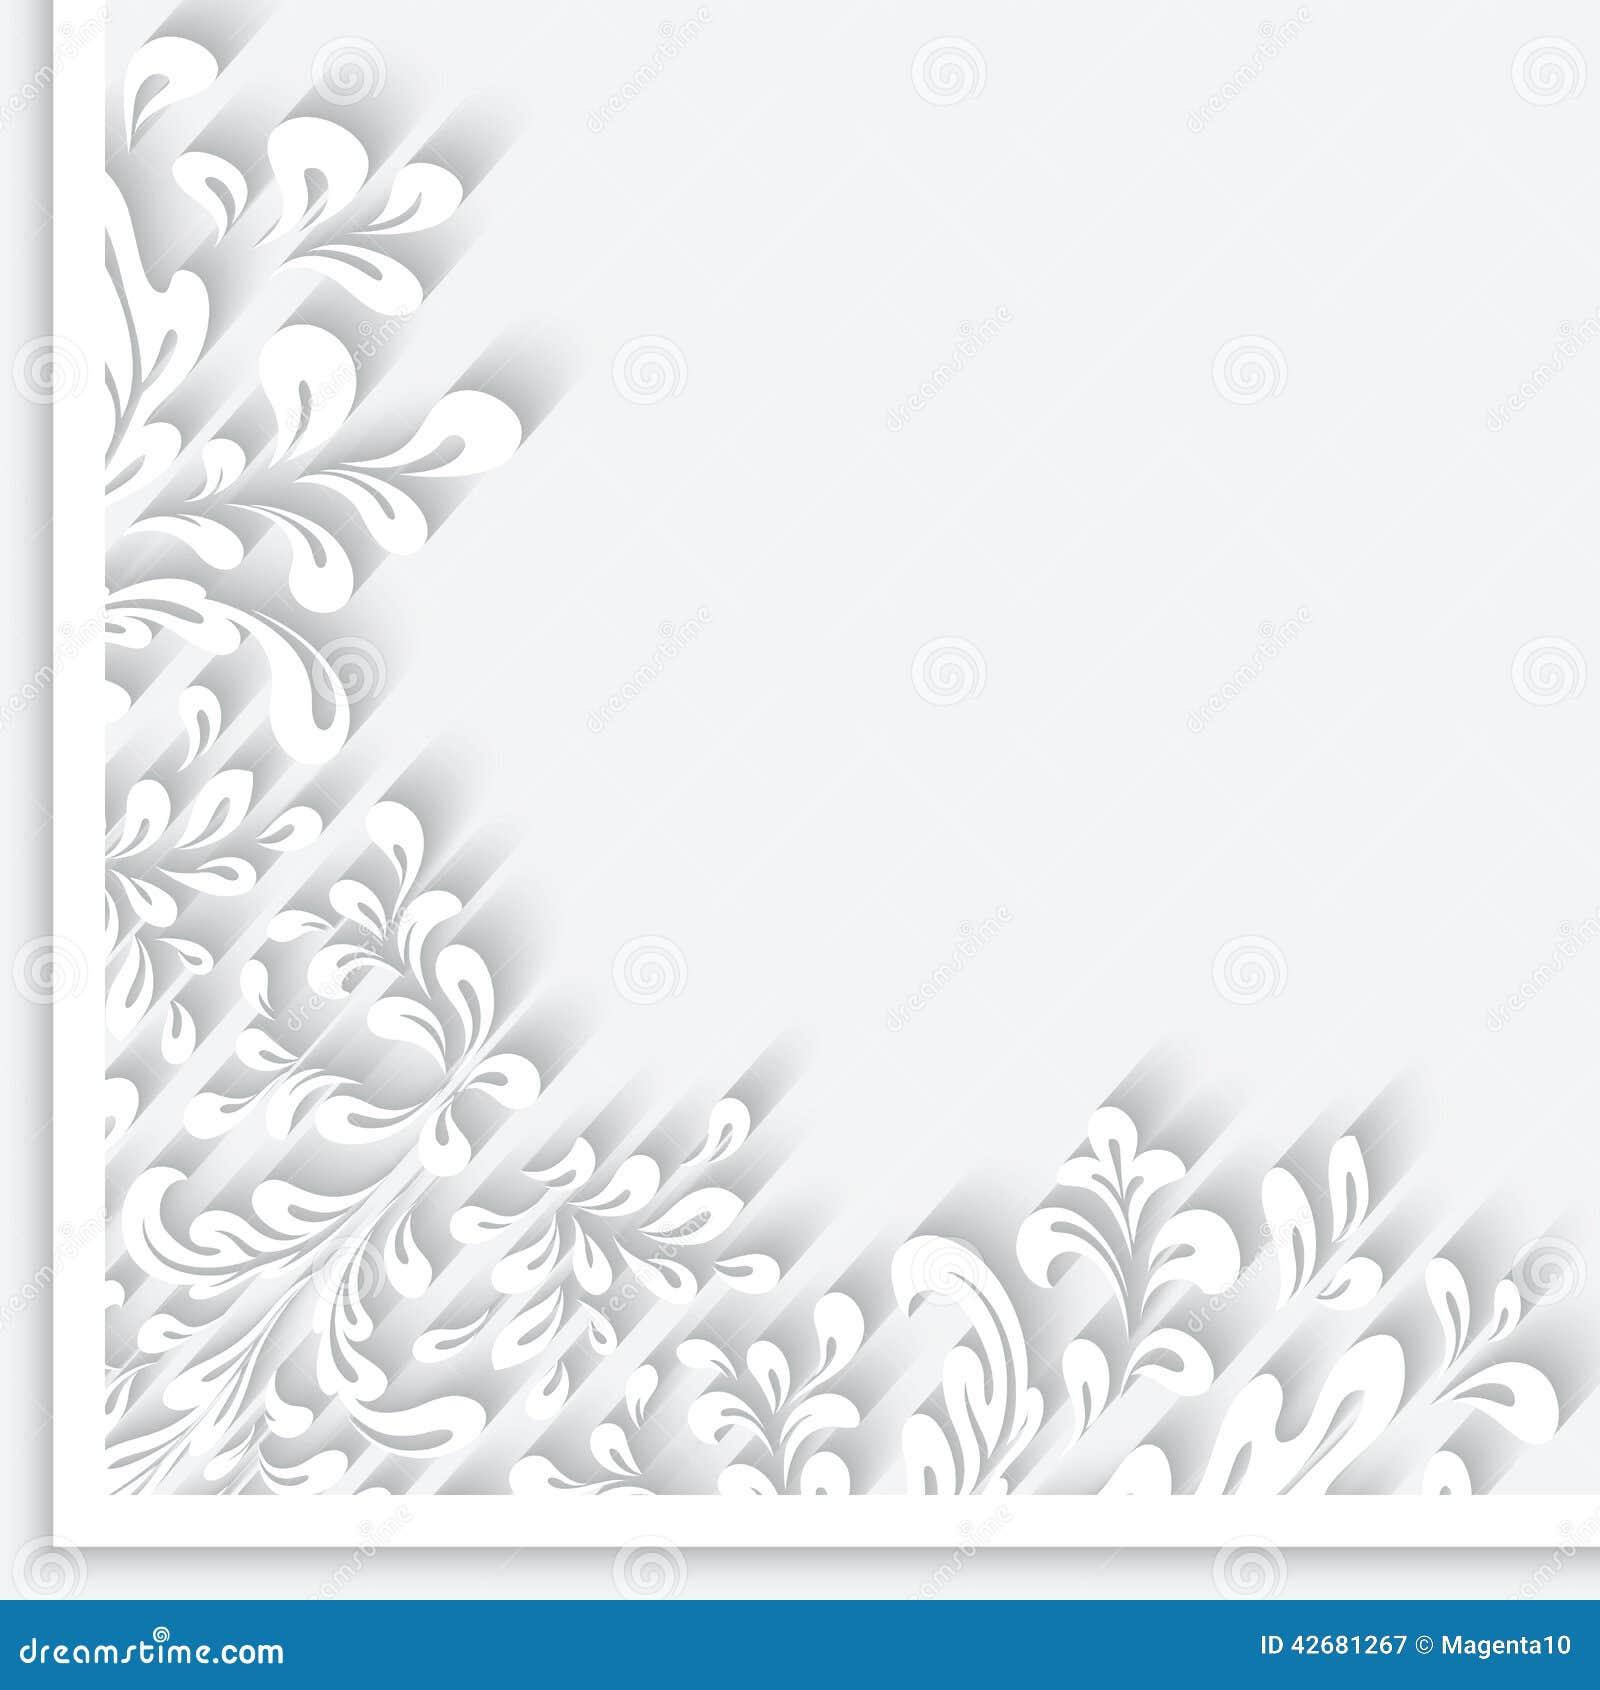 Paper swirls corner ornament stock vector illustration for Paper swirl decorations